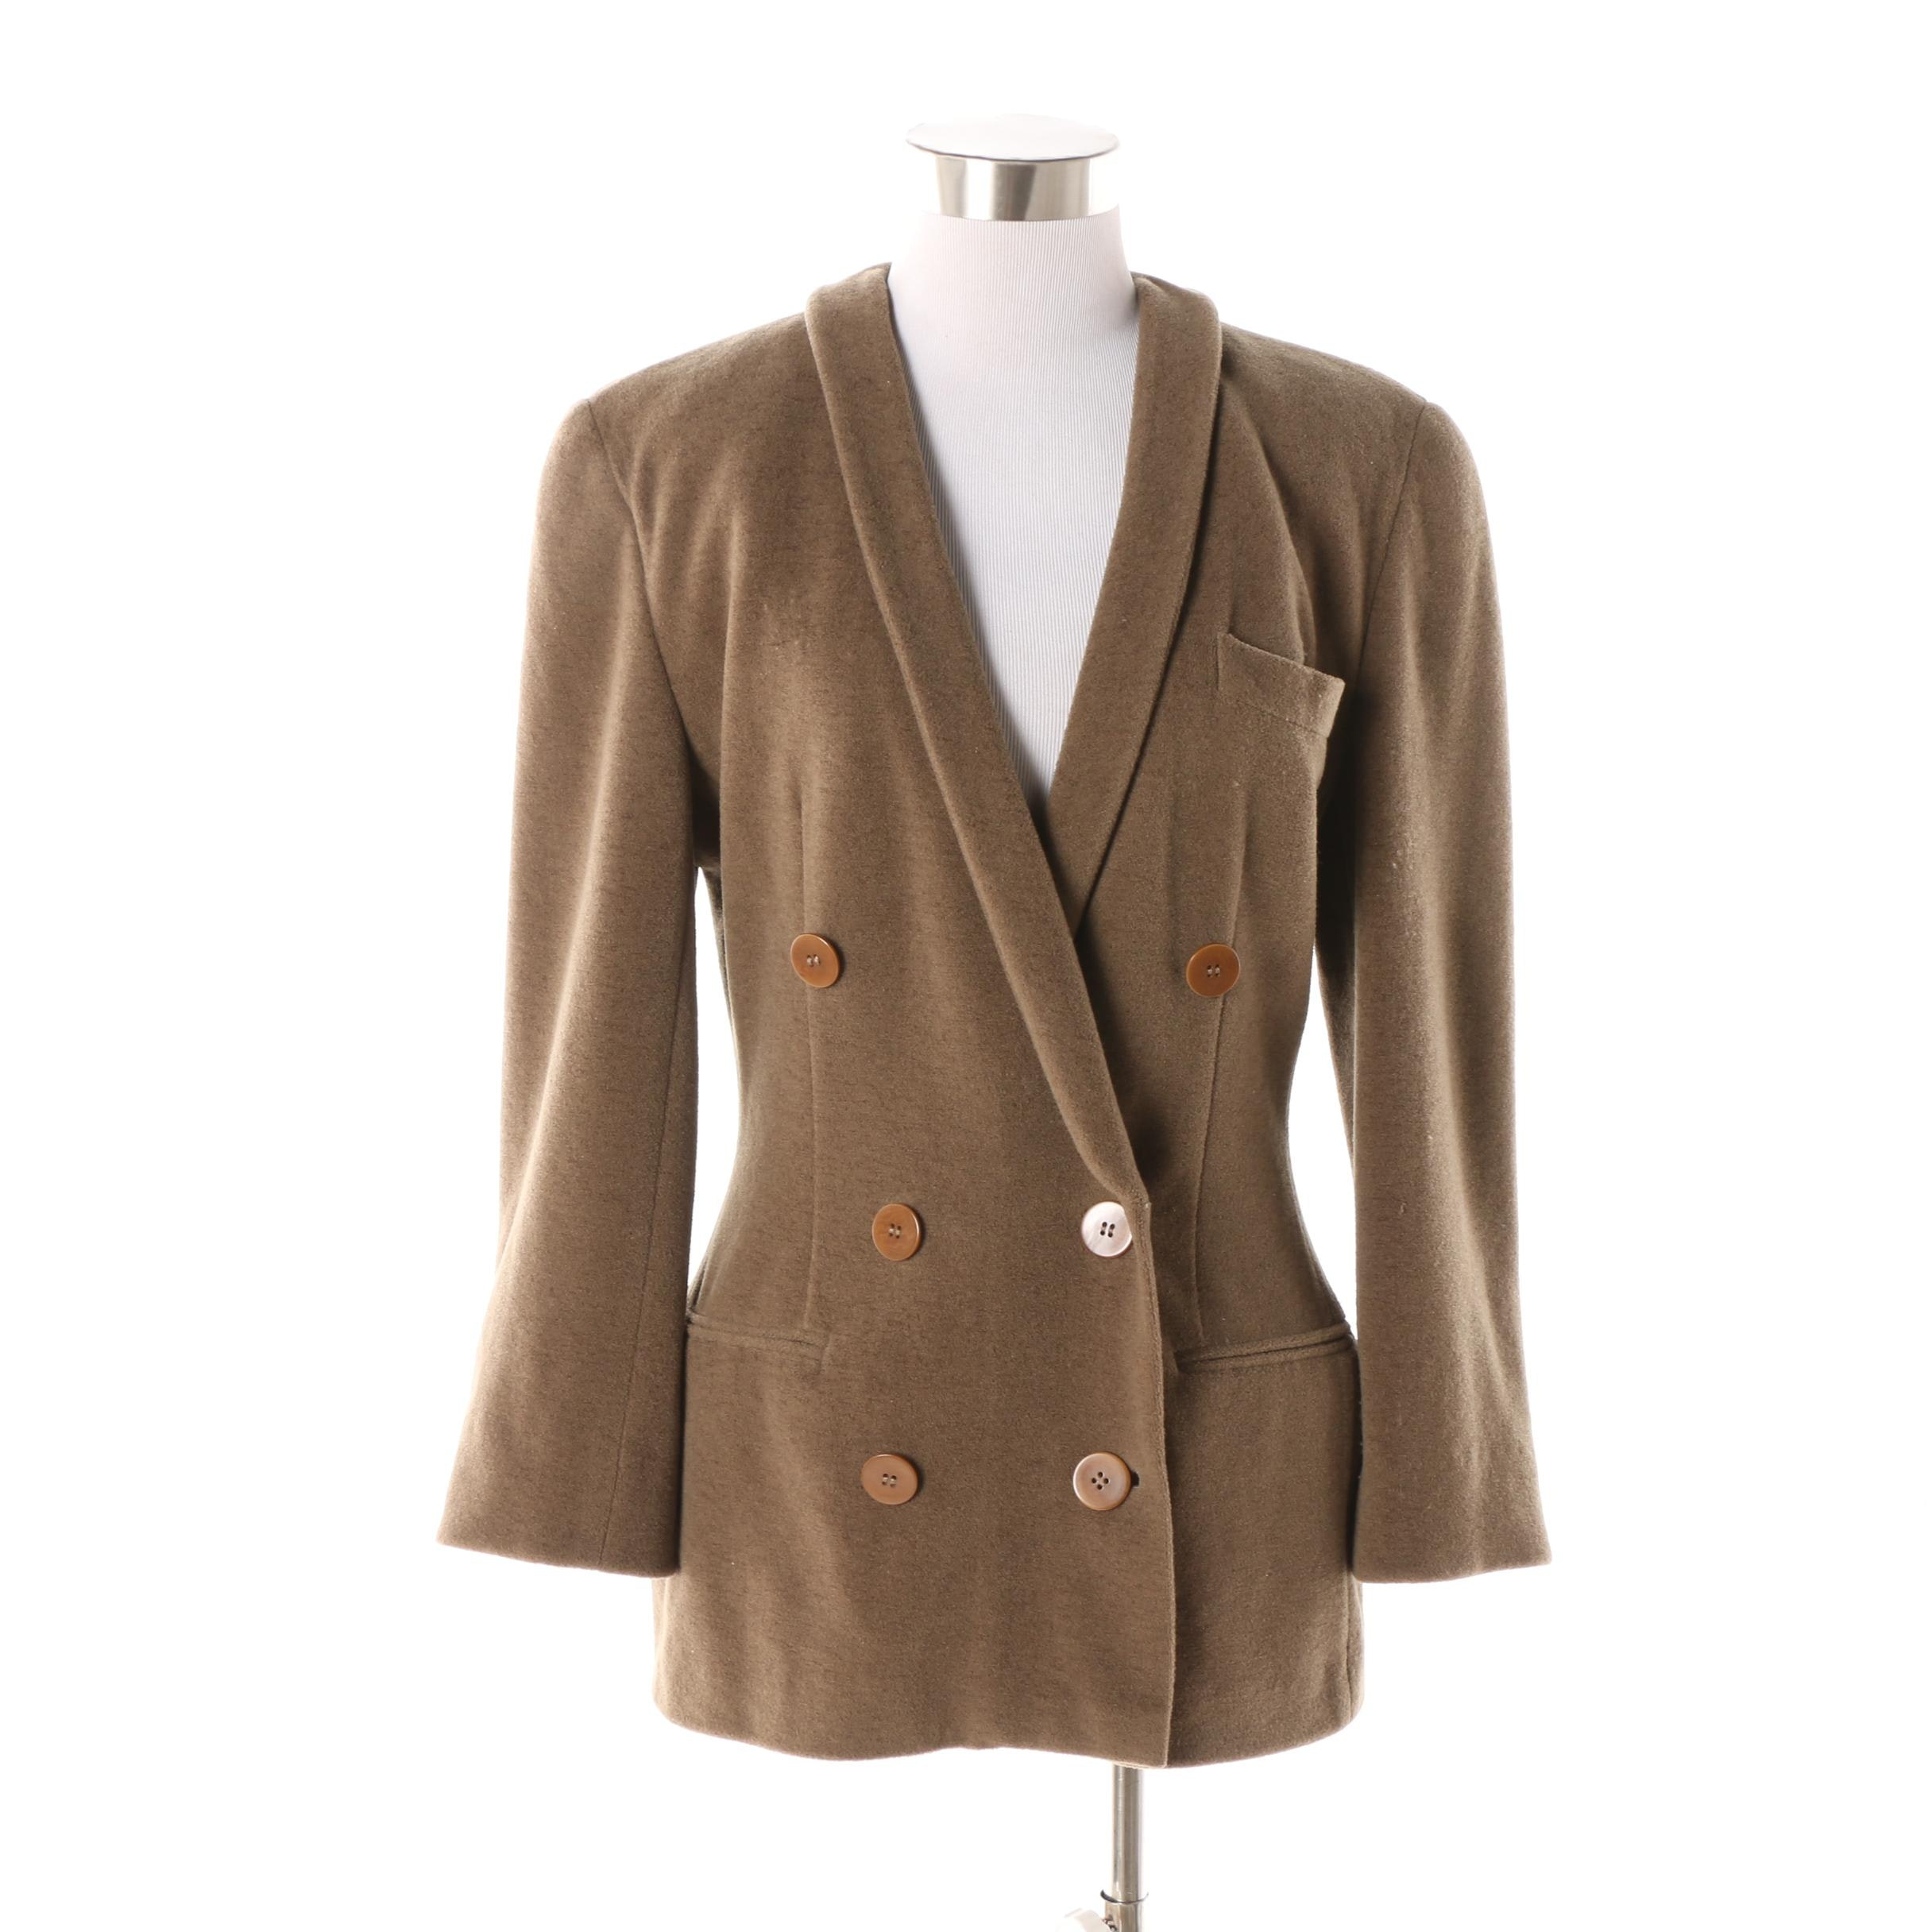 Circa 1990s Women's Giorgio Armani Double-Breasted Taupe Wool Jacket